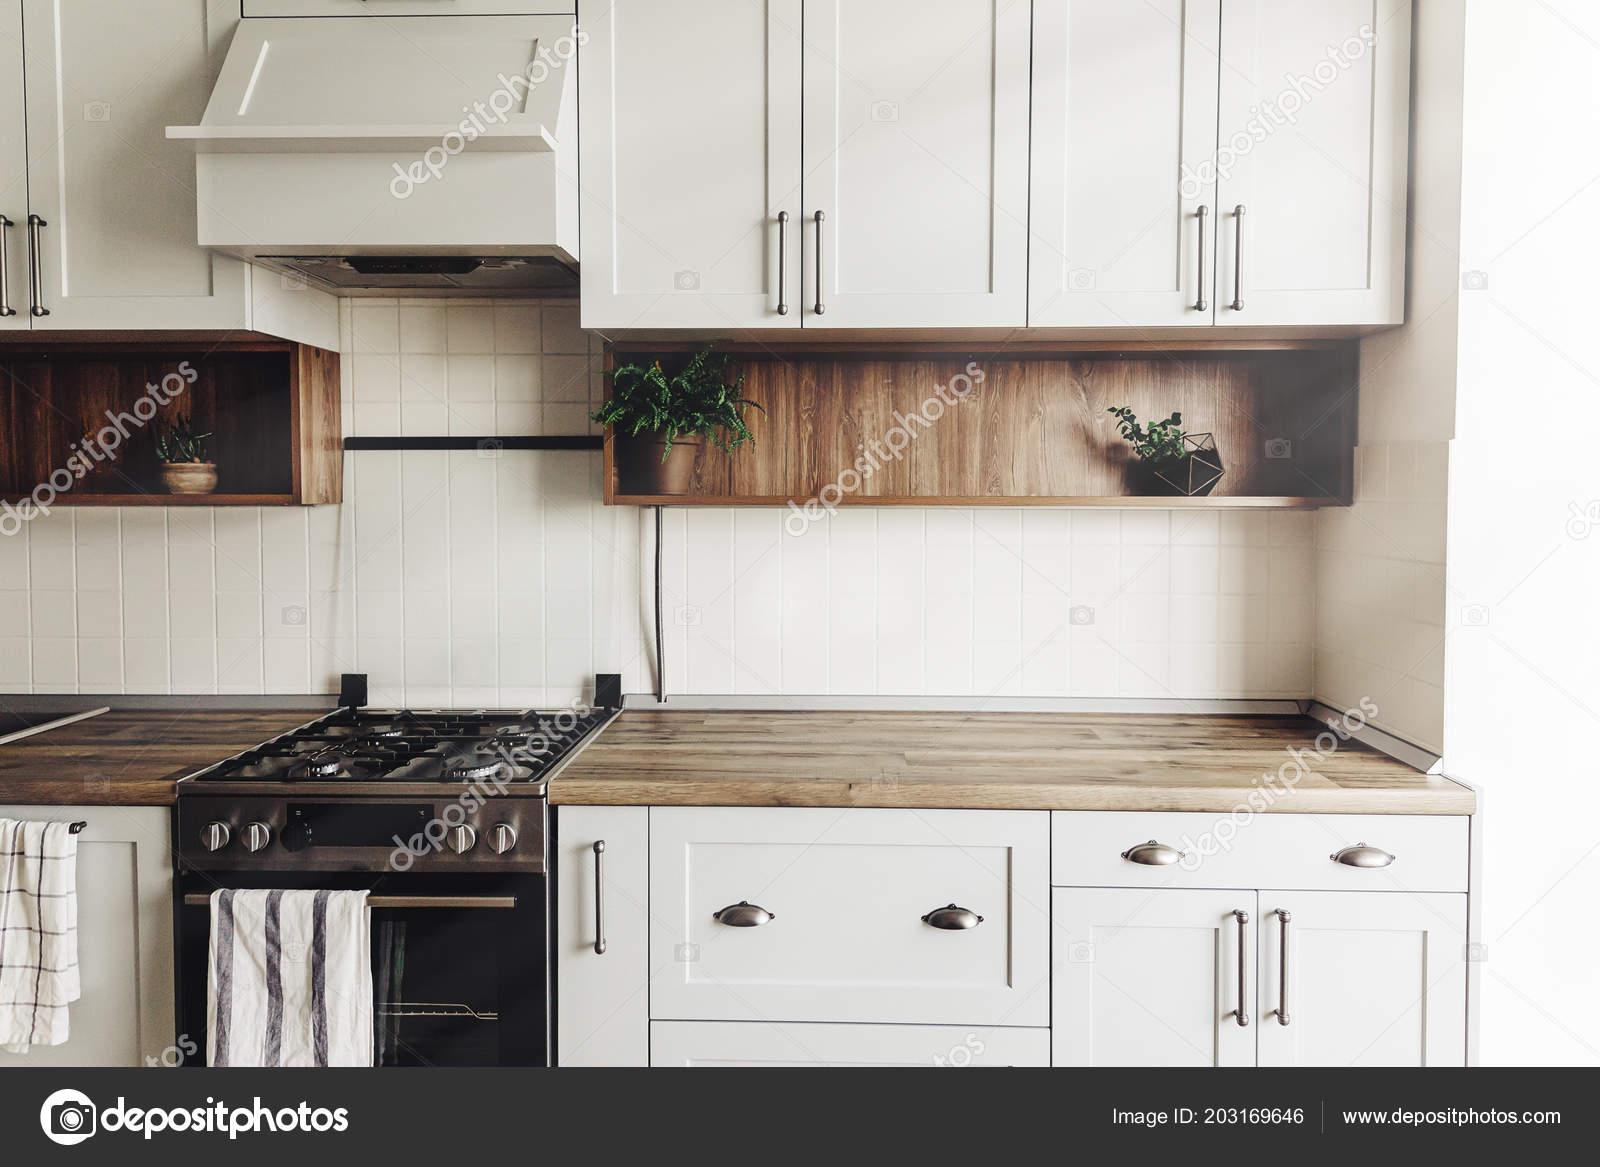 Cucina Design Moderno Stile Scandinavo Interni Cucina Grigio Luce ...